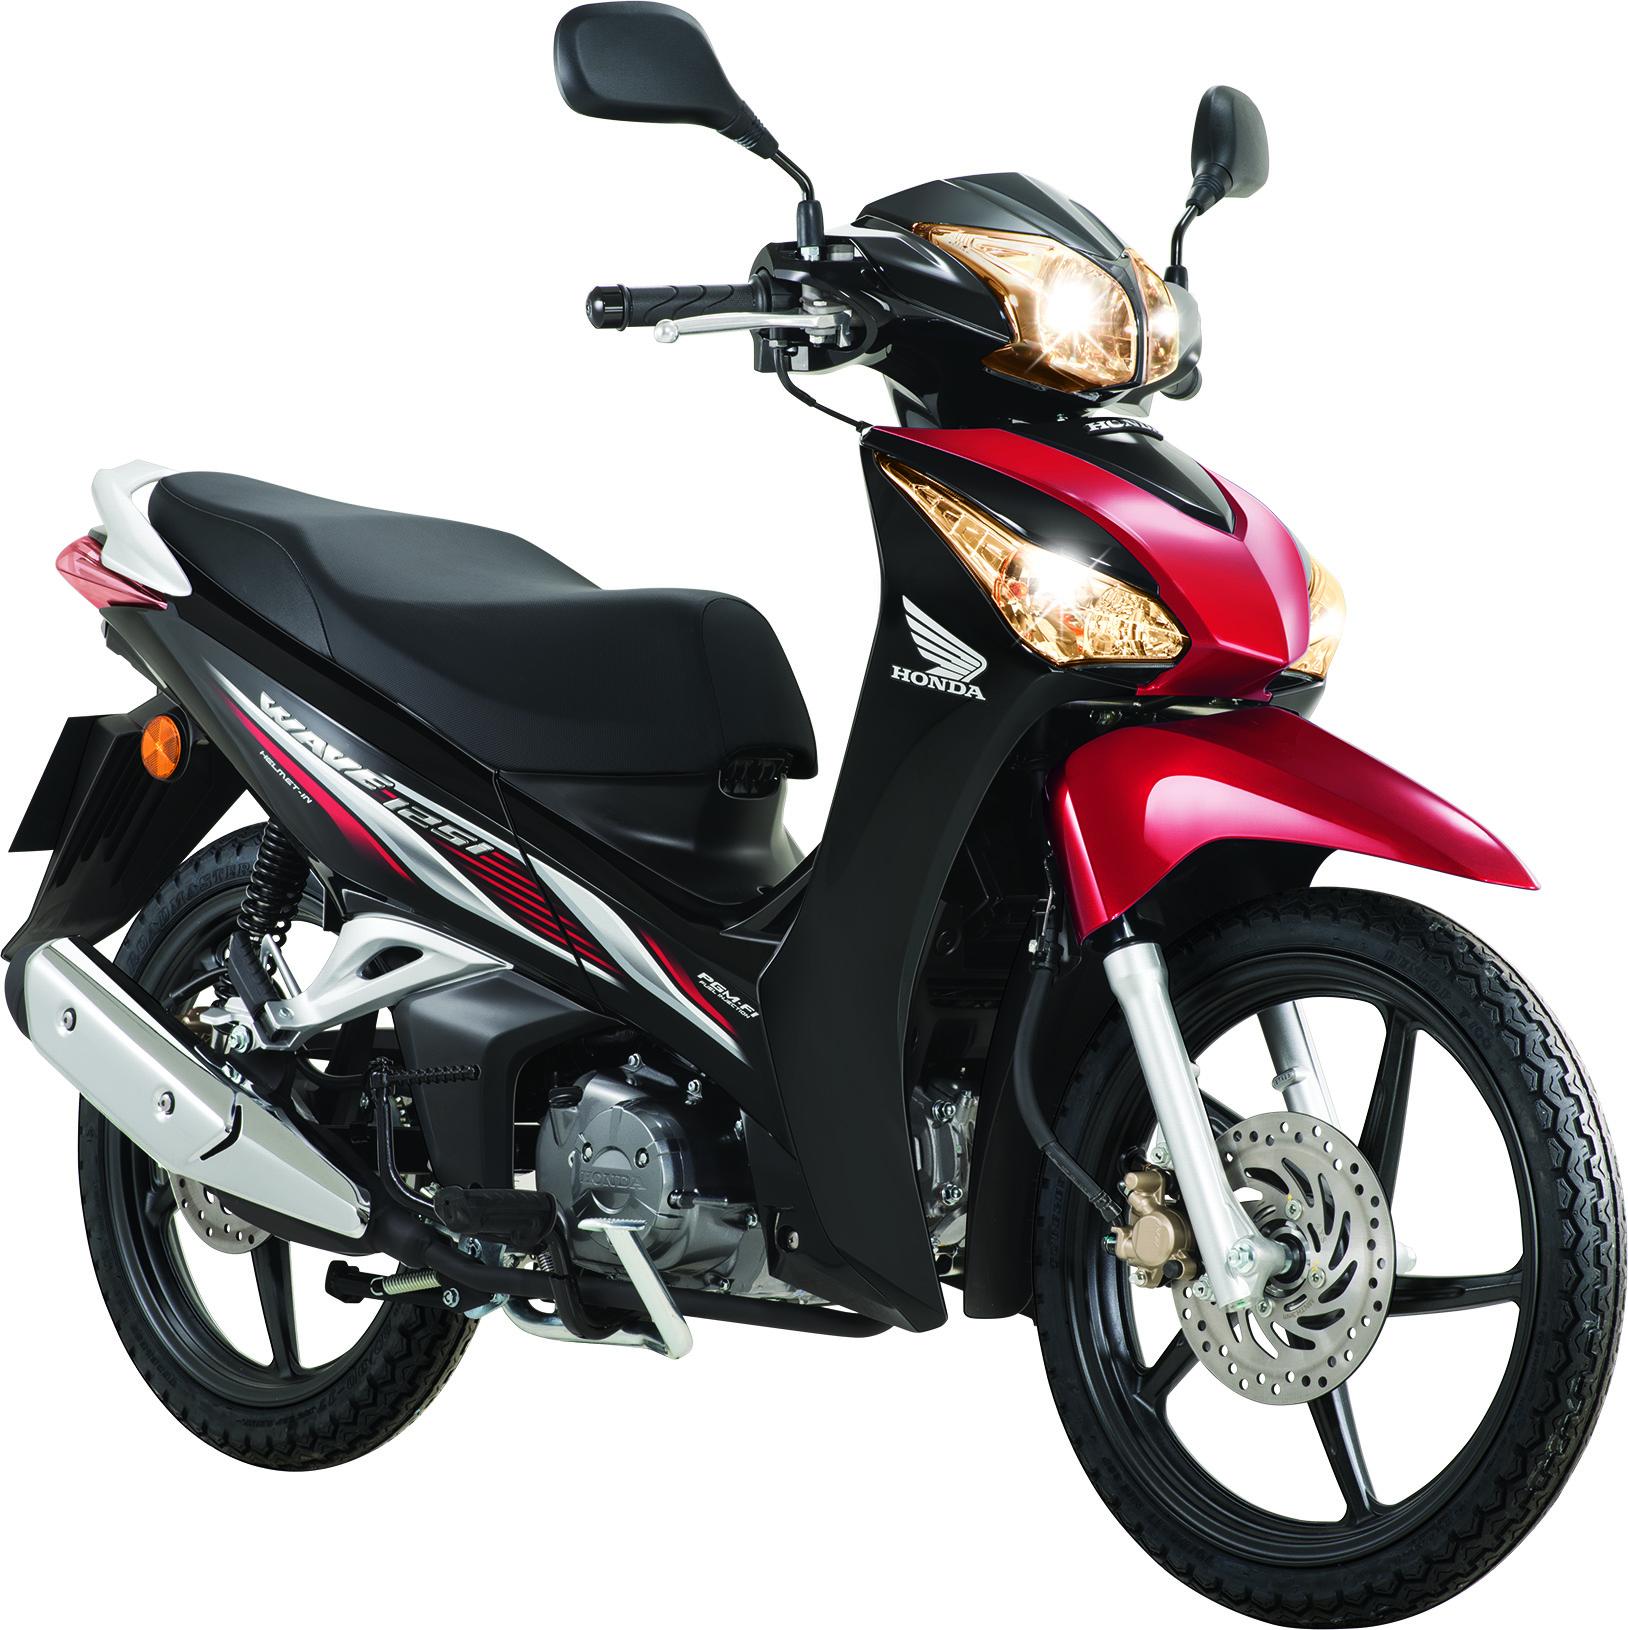 Boon Siew Honda S New 2017 Honda Wave 125i Bikesrepublic